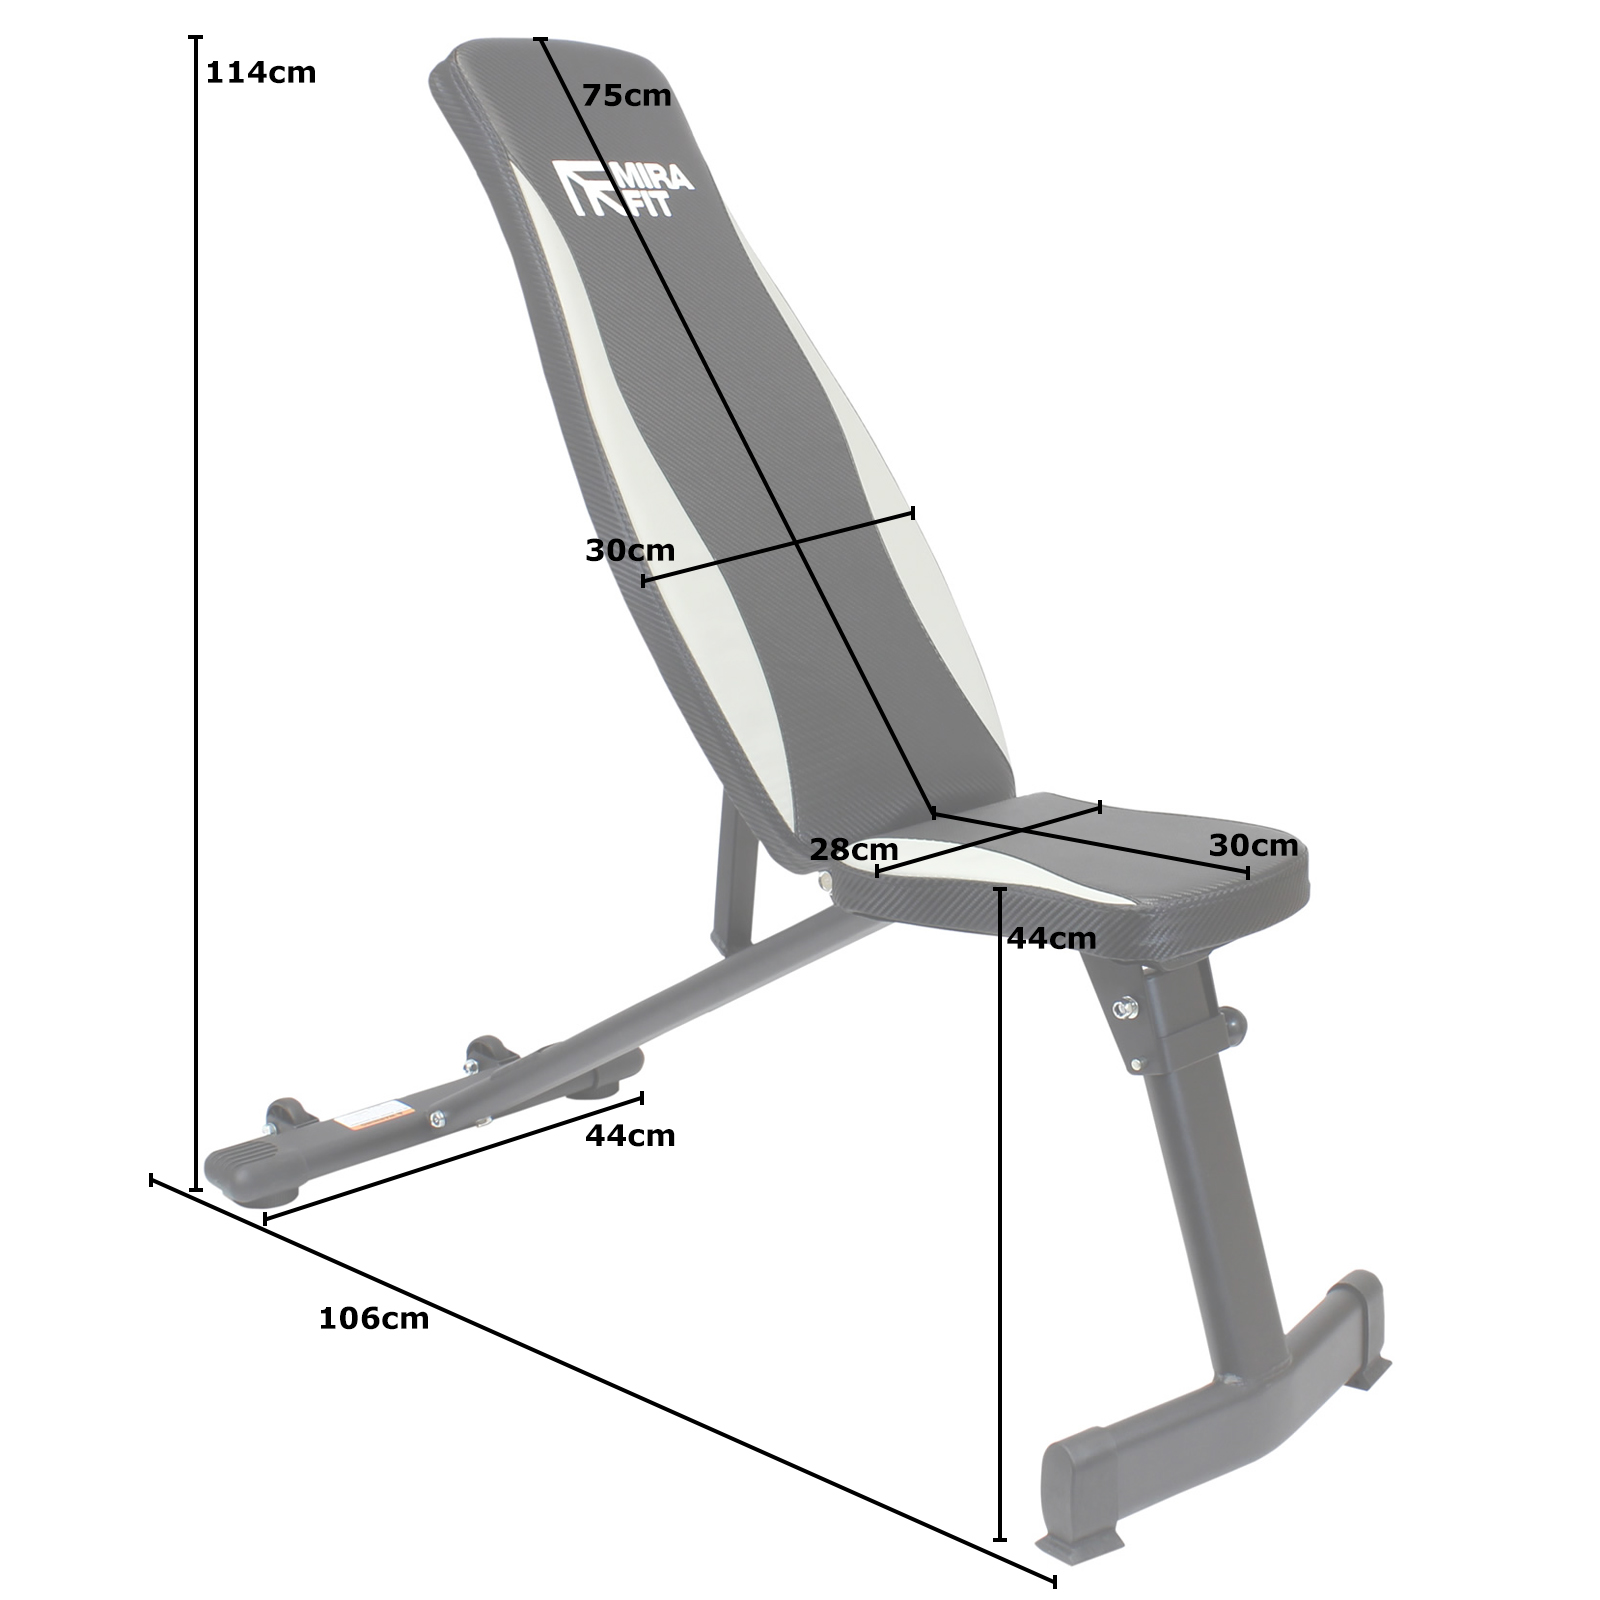 press weight chest folding station adjustable itm bench flat mirafit lifting dip sentinel bar